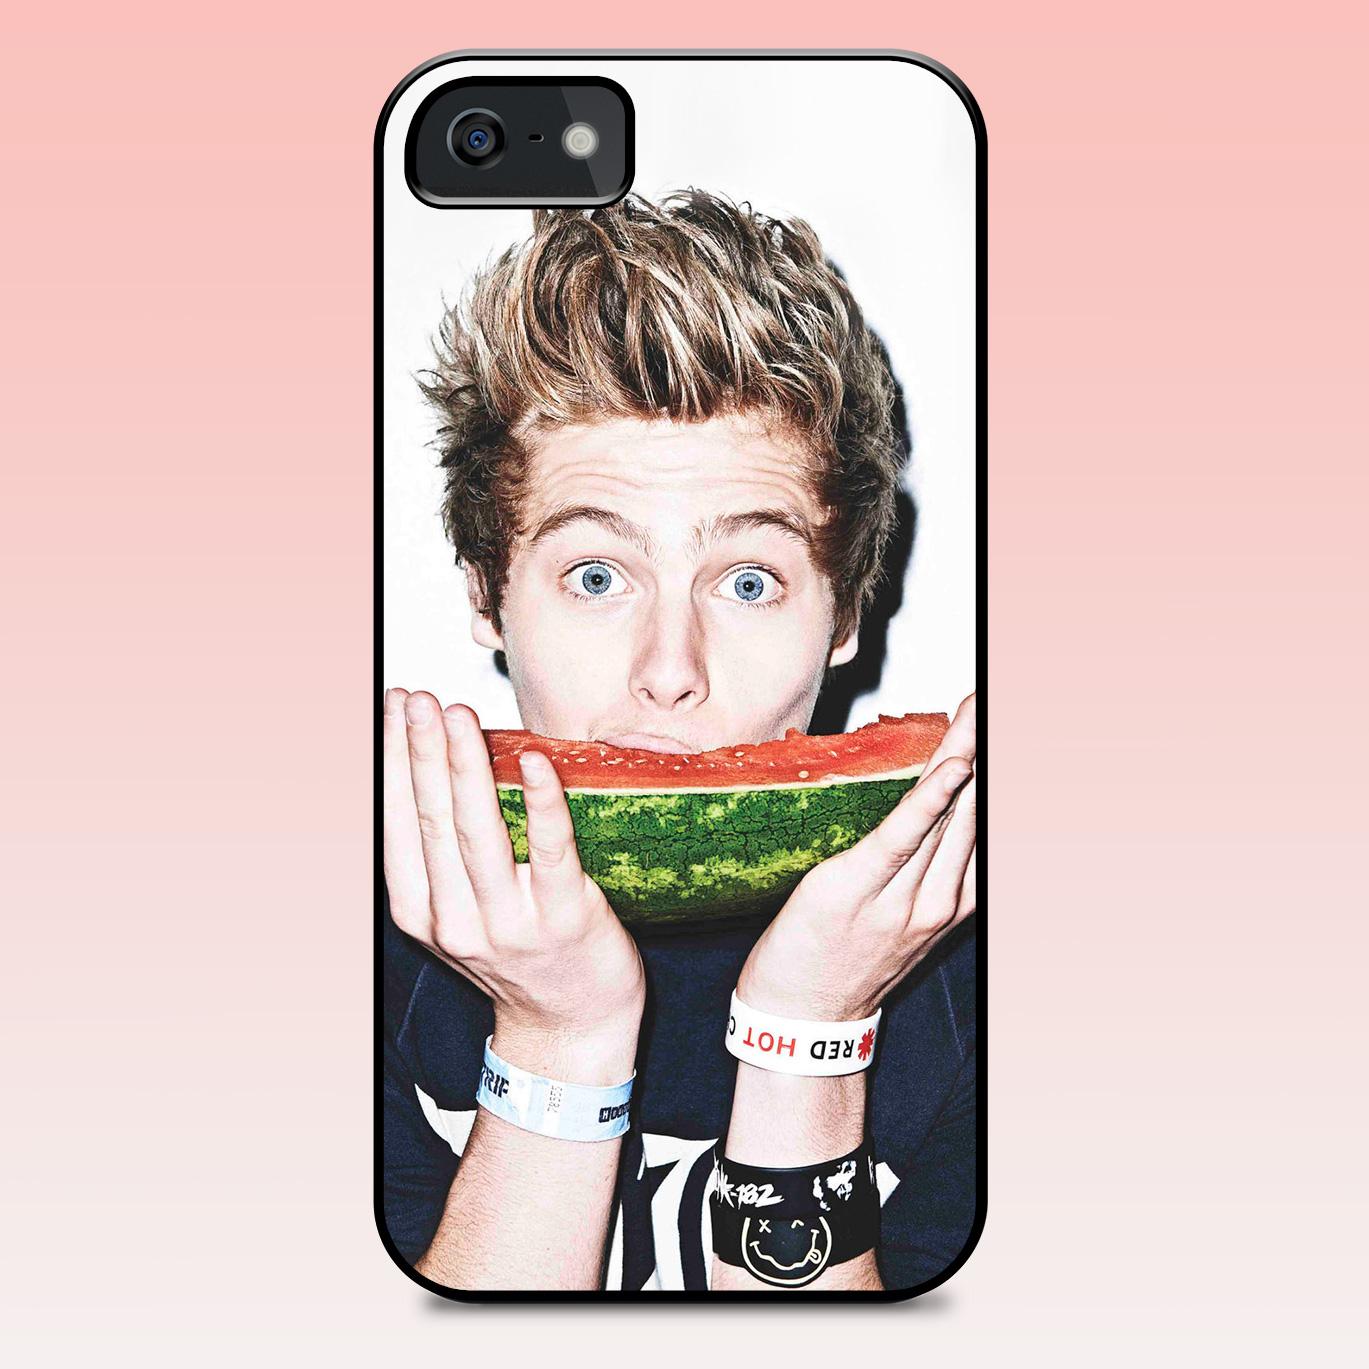 Luke Hemmings / Watermelon